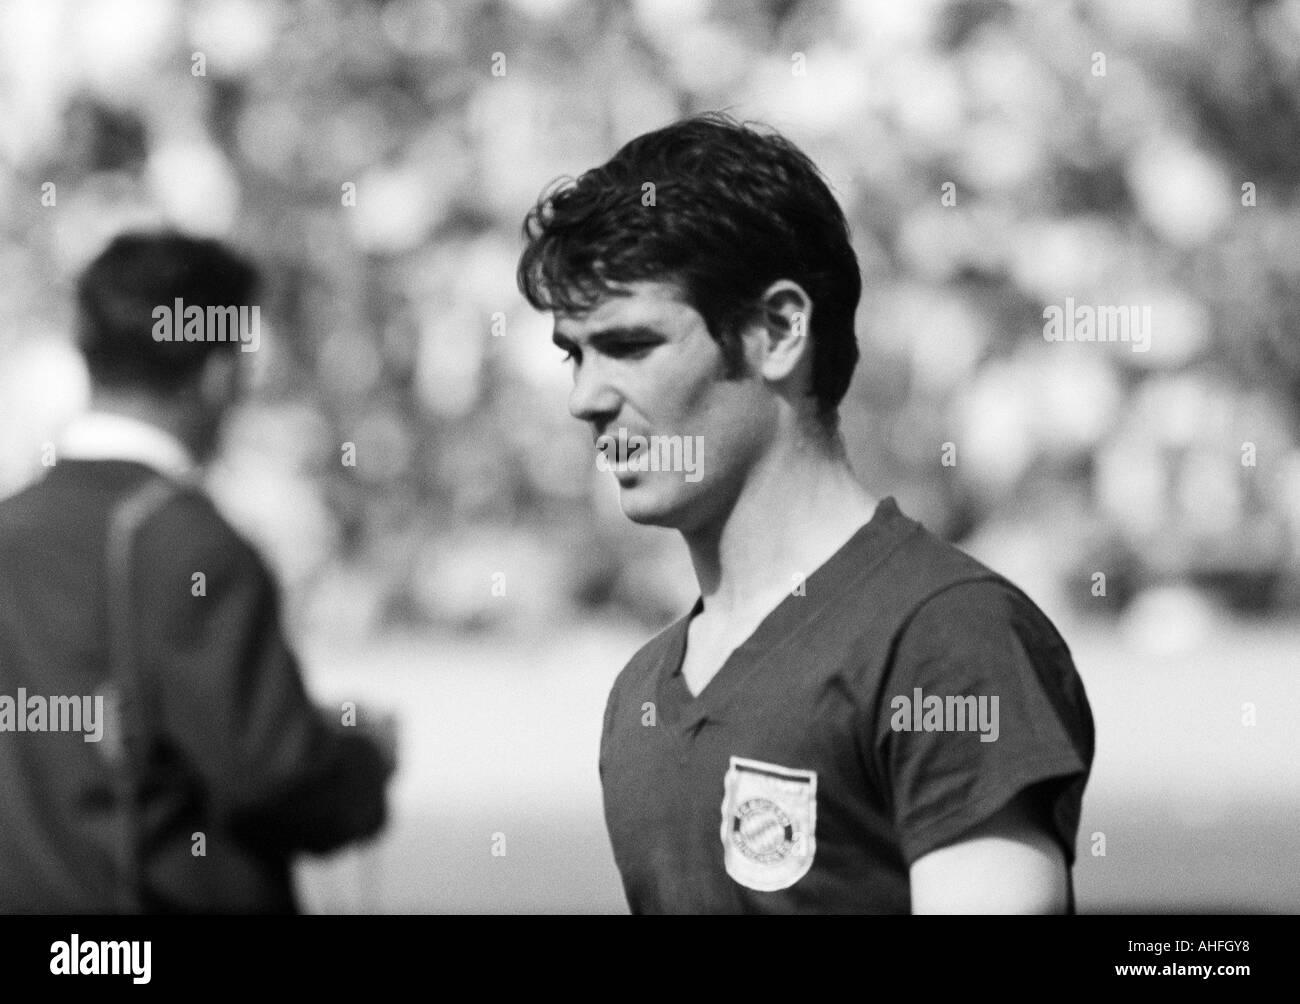 football, Bundesliga, 1965/1966, Wedau Stadium in Duisburg, Meidericher SV versus FC Bayern Munich 1:1, football player, portrait of Rudolf Nafziger - Stock Image